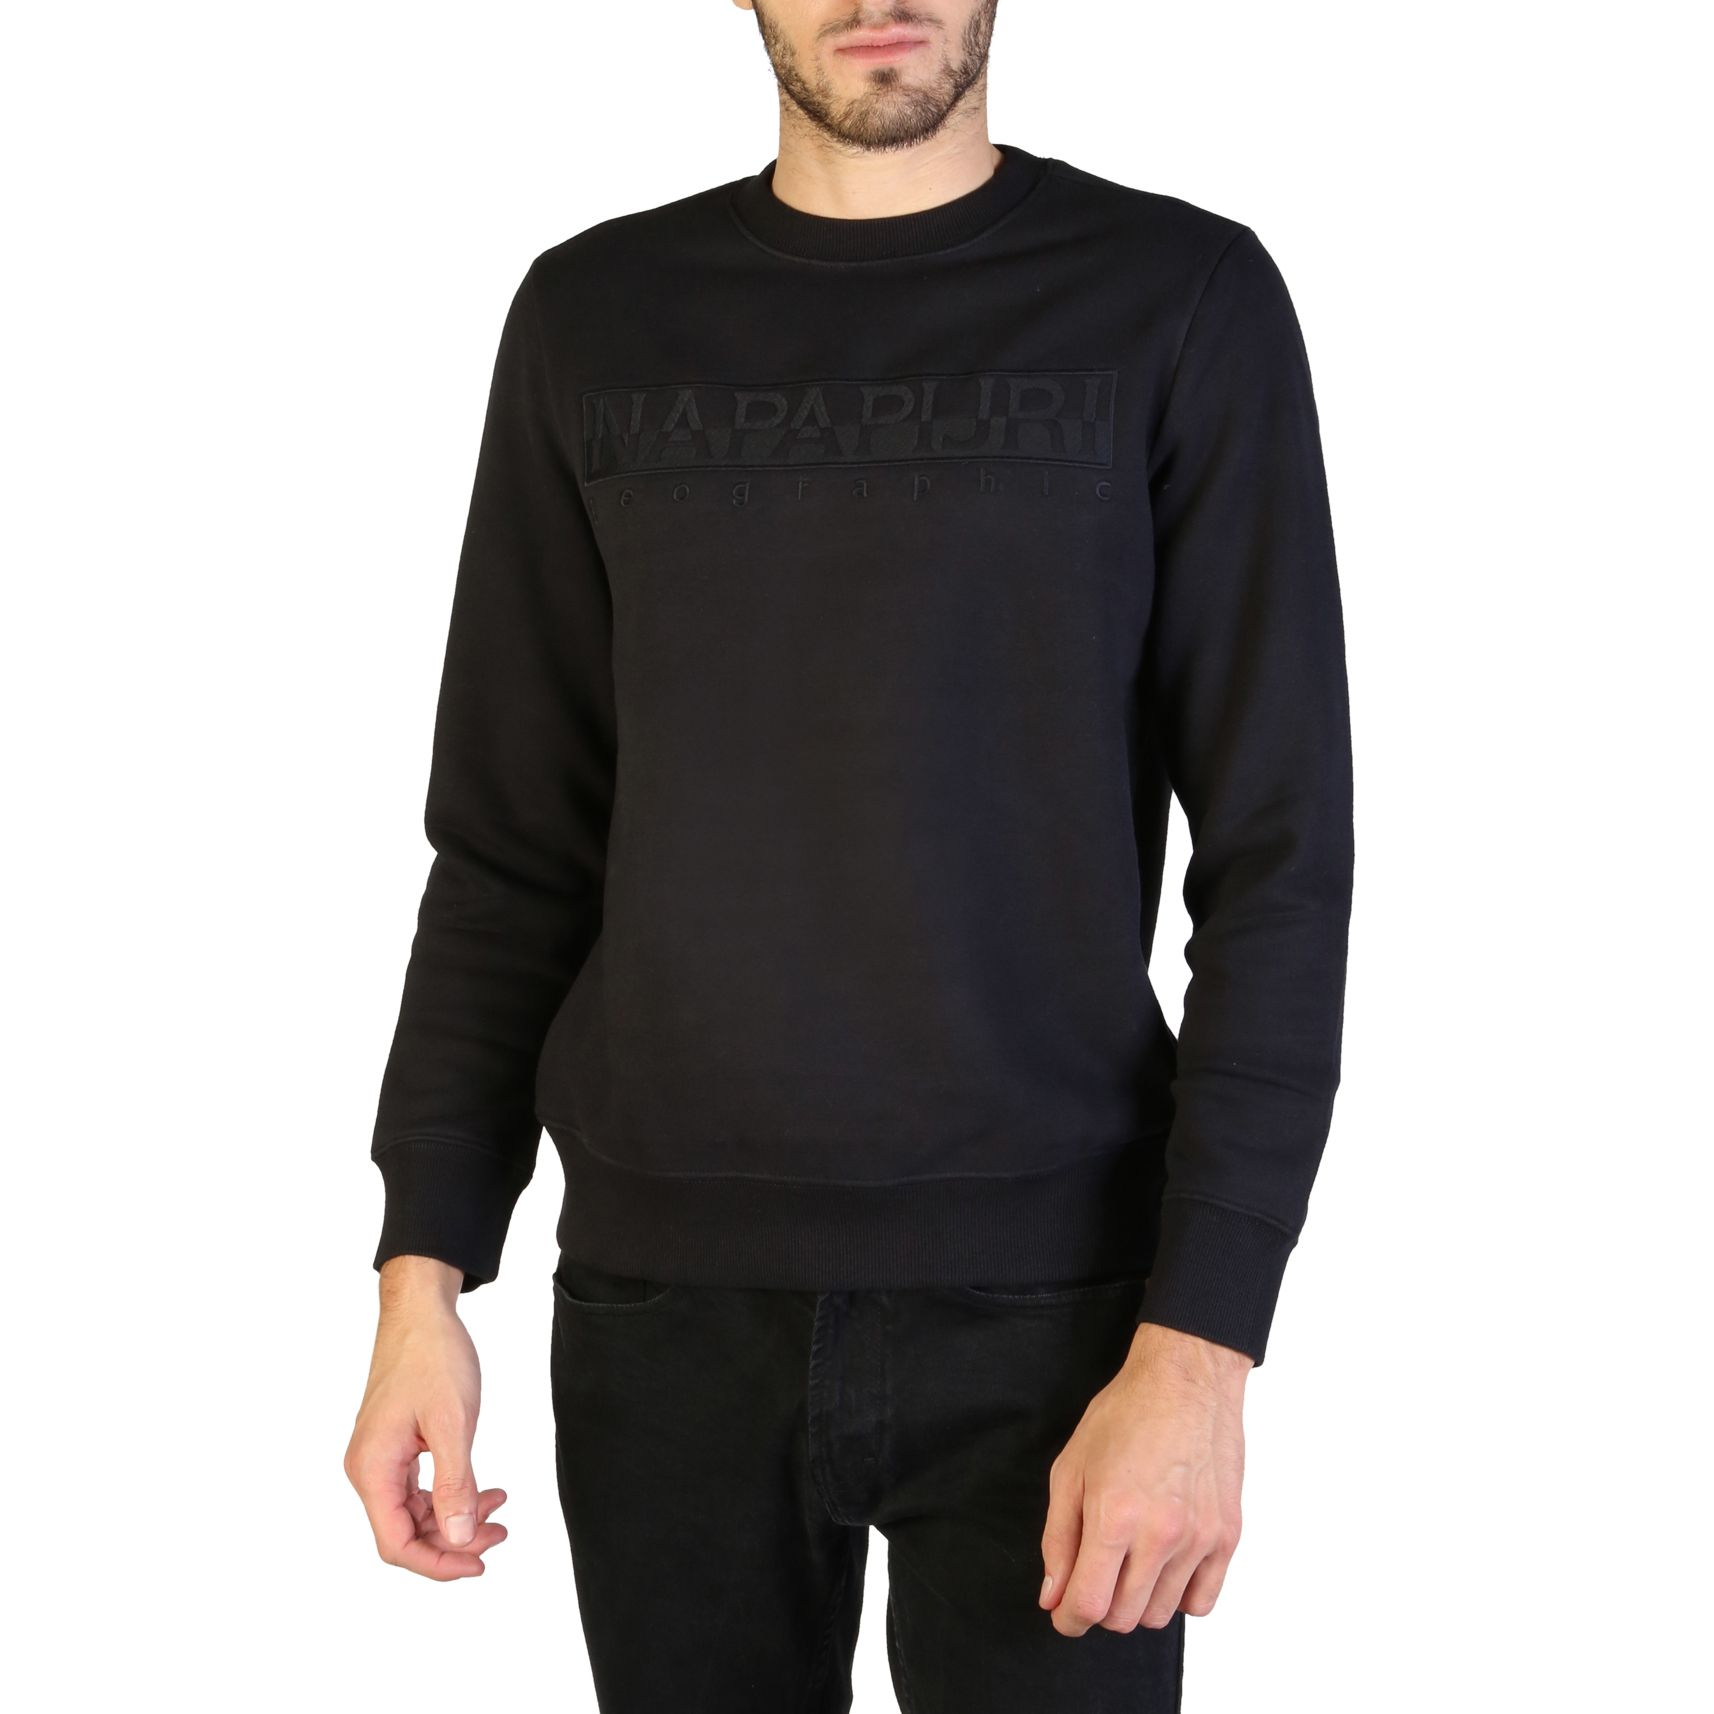 Napapijri Mens Sweatshirts